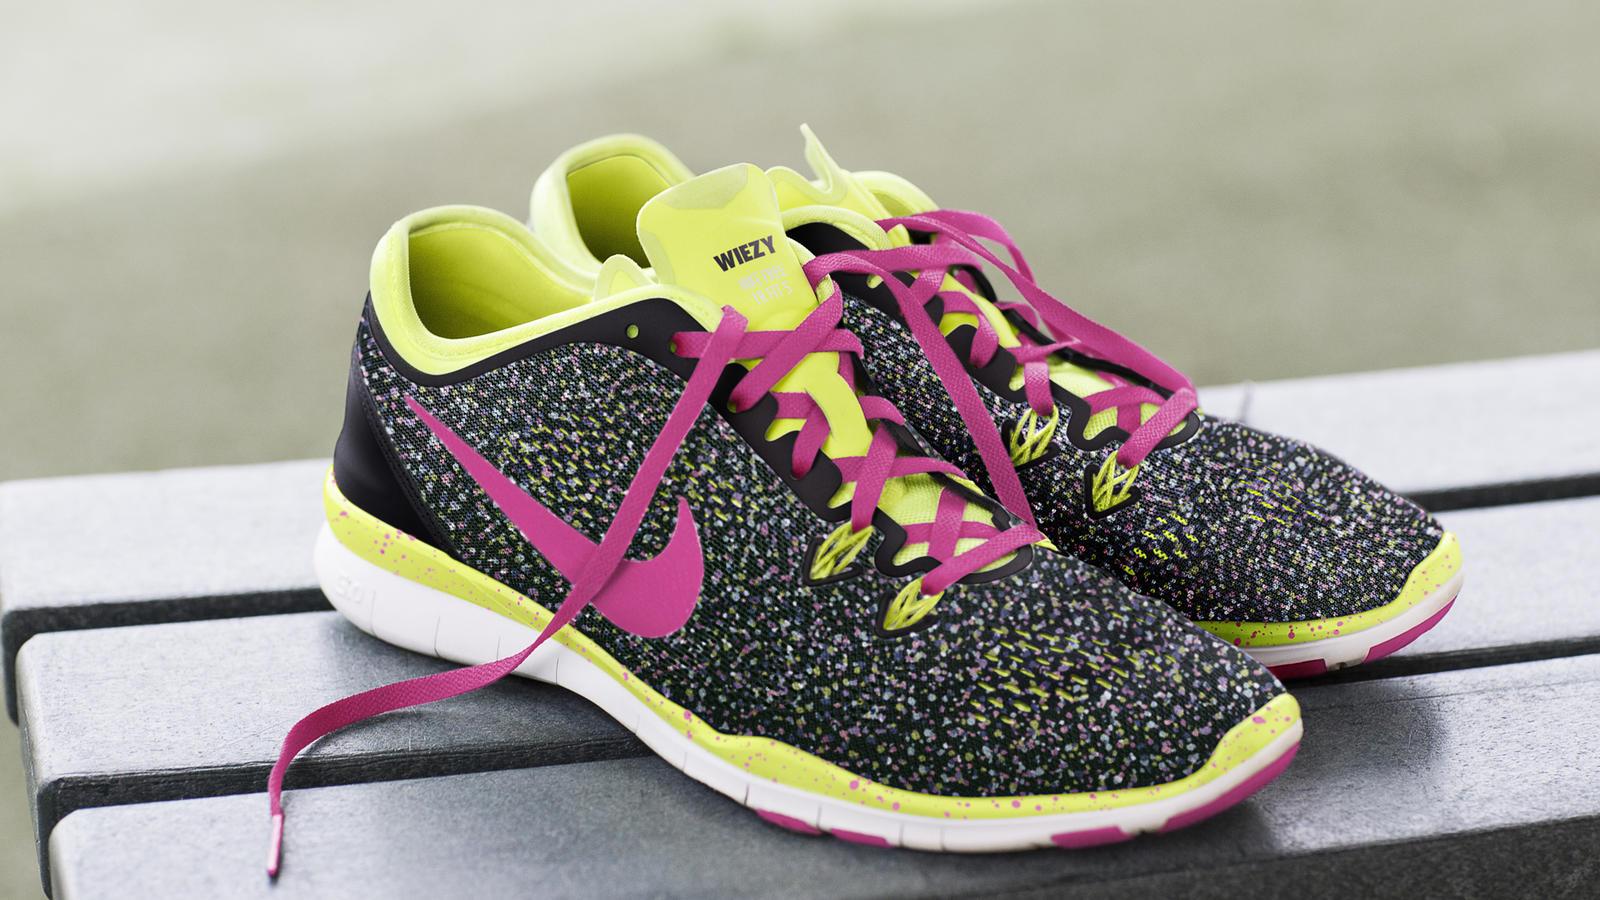 the best attitude 58bb6 6f6c6 Nike Free TR 5 - Michelle Wie